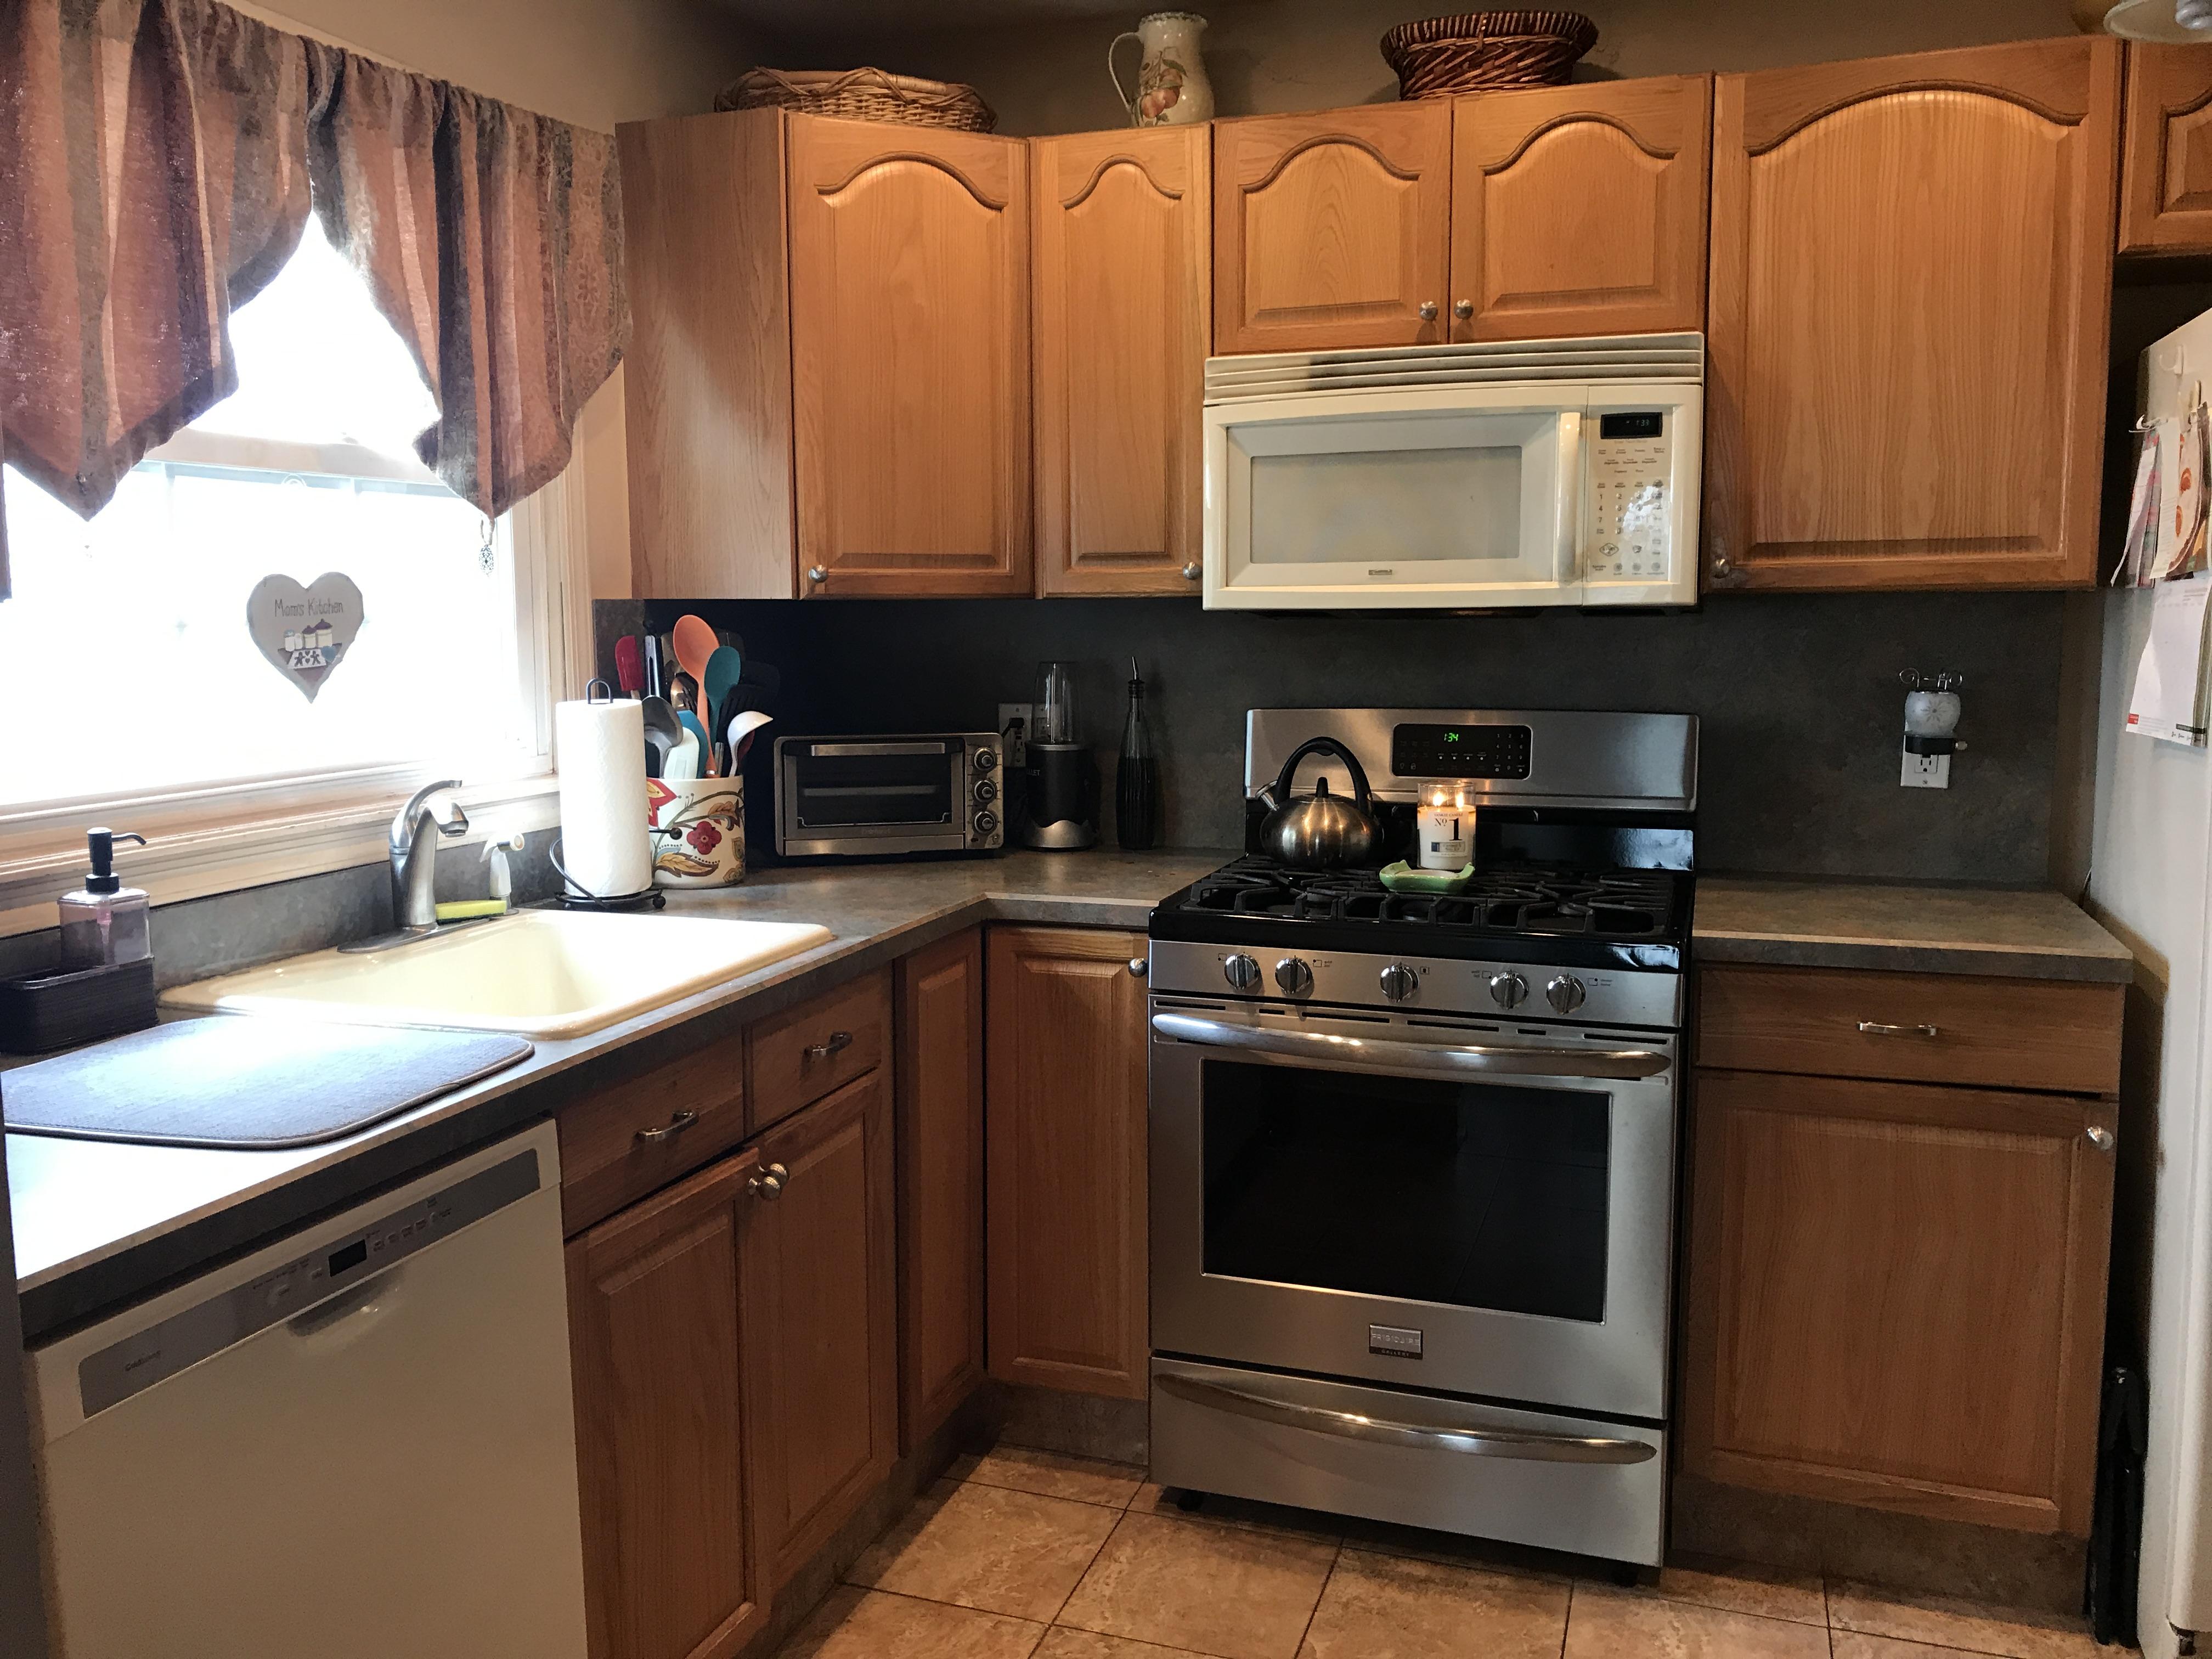 Staten Island Real Estate – Rosemarie Rivicci 917 846 5795